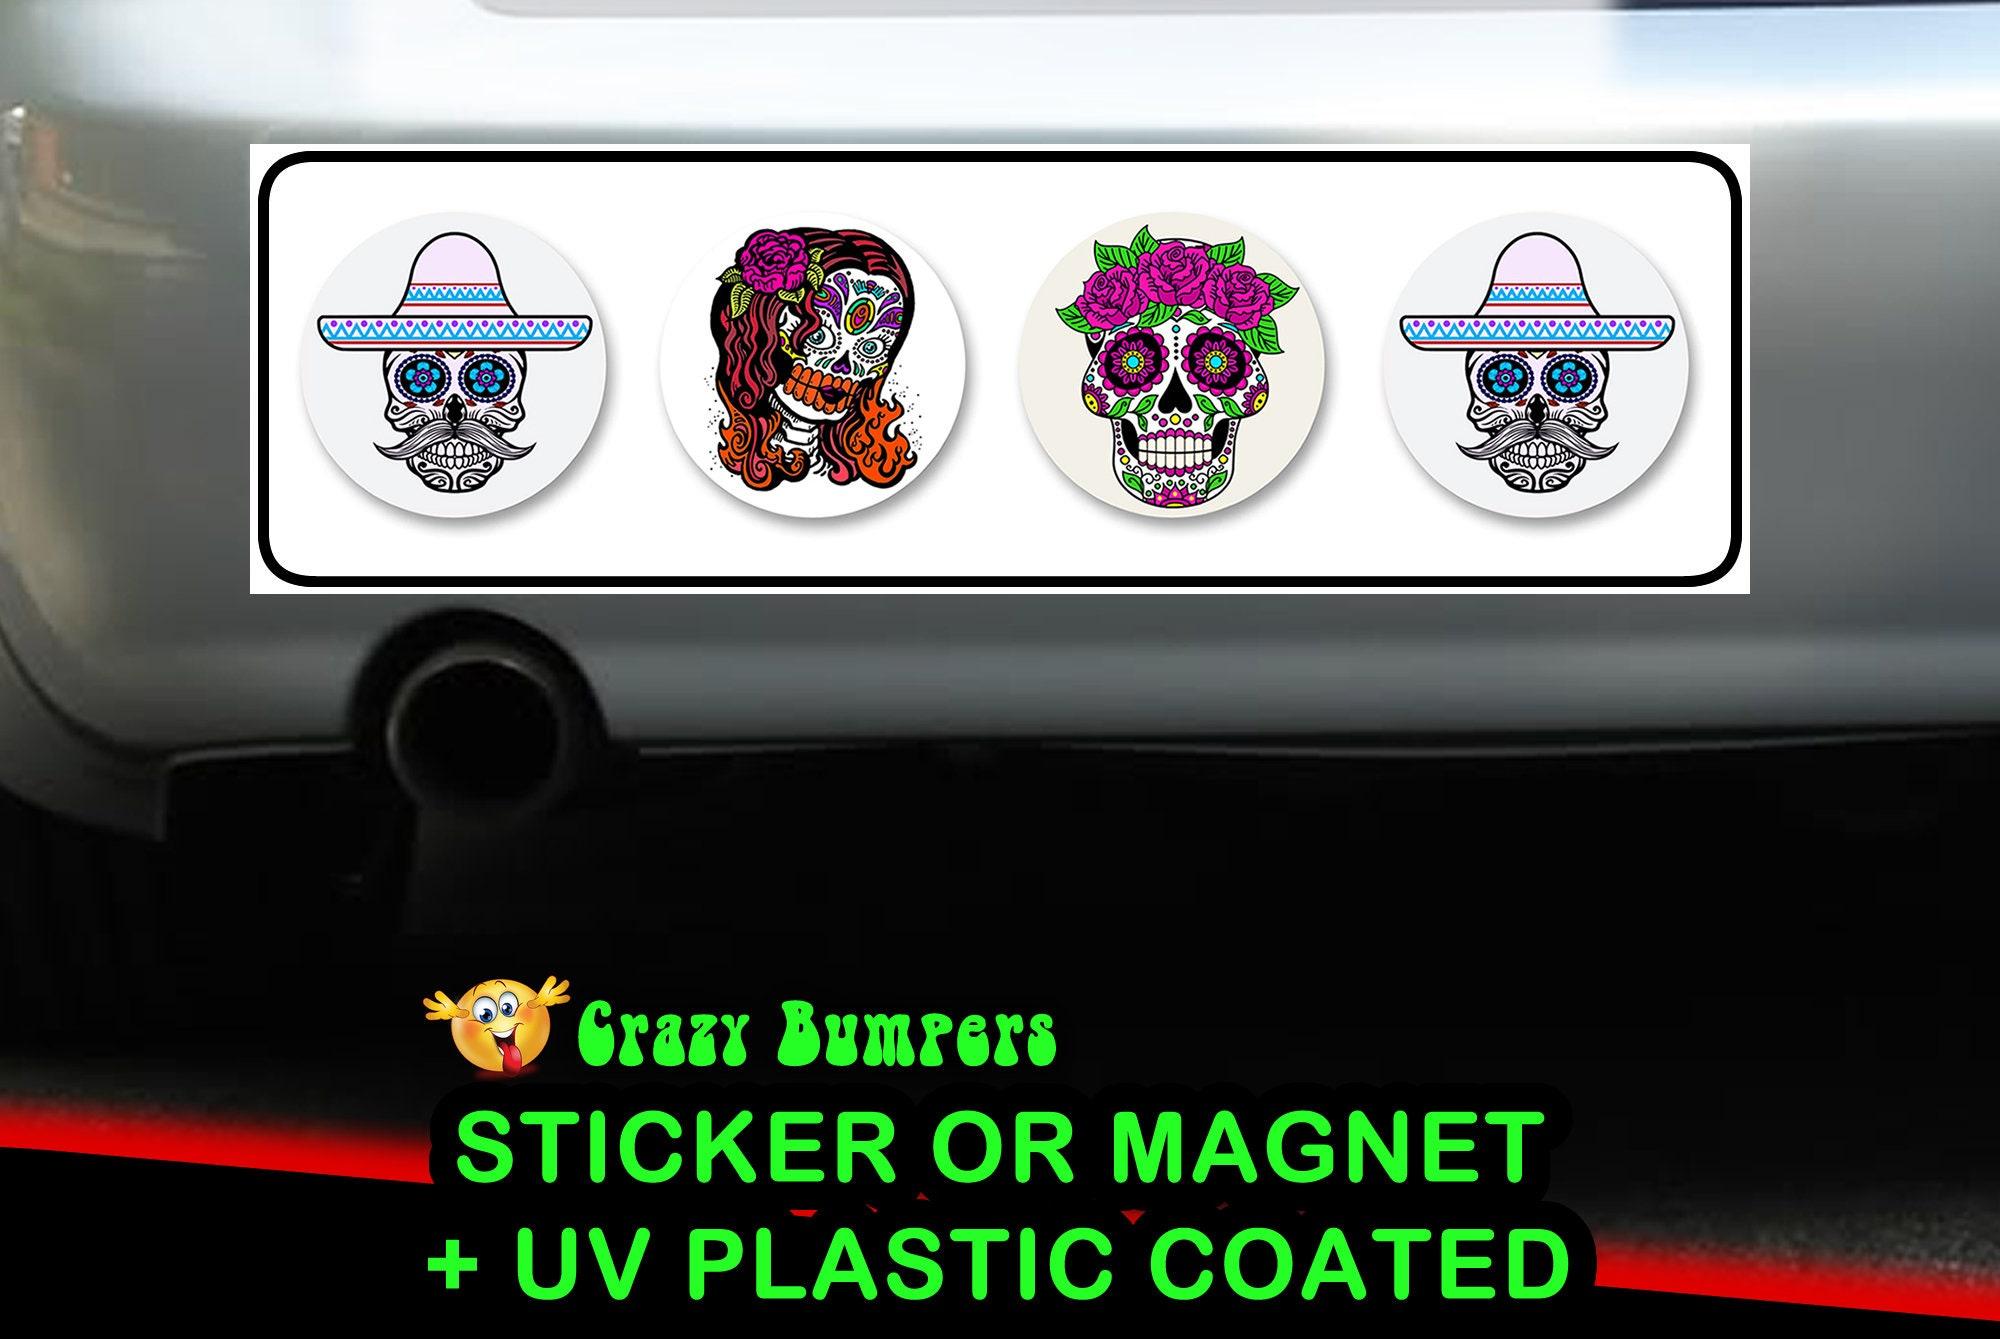 CAD$7.99 - Skull Candy Bumper Sticker 10 x 3 Bumper Sticker or Magnetic Bumper Sticker Available